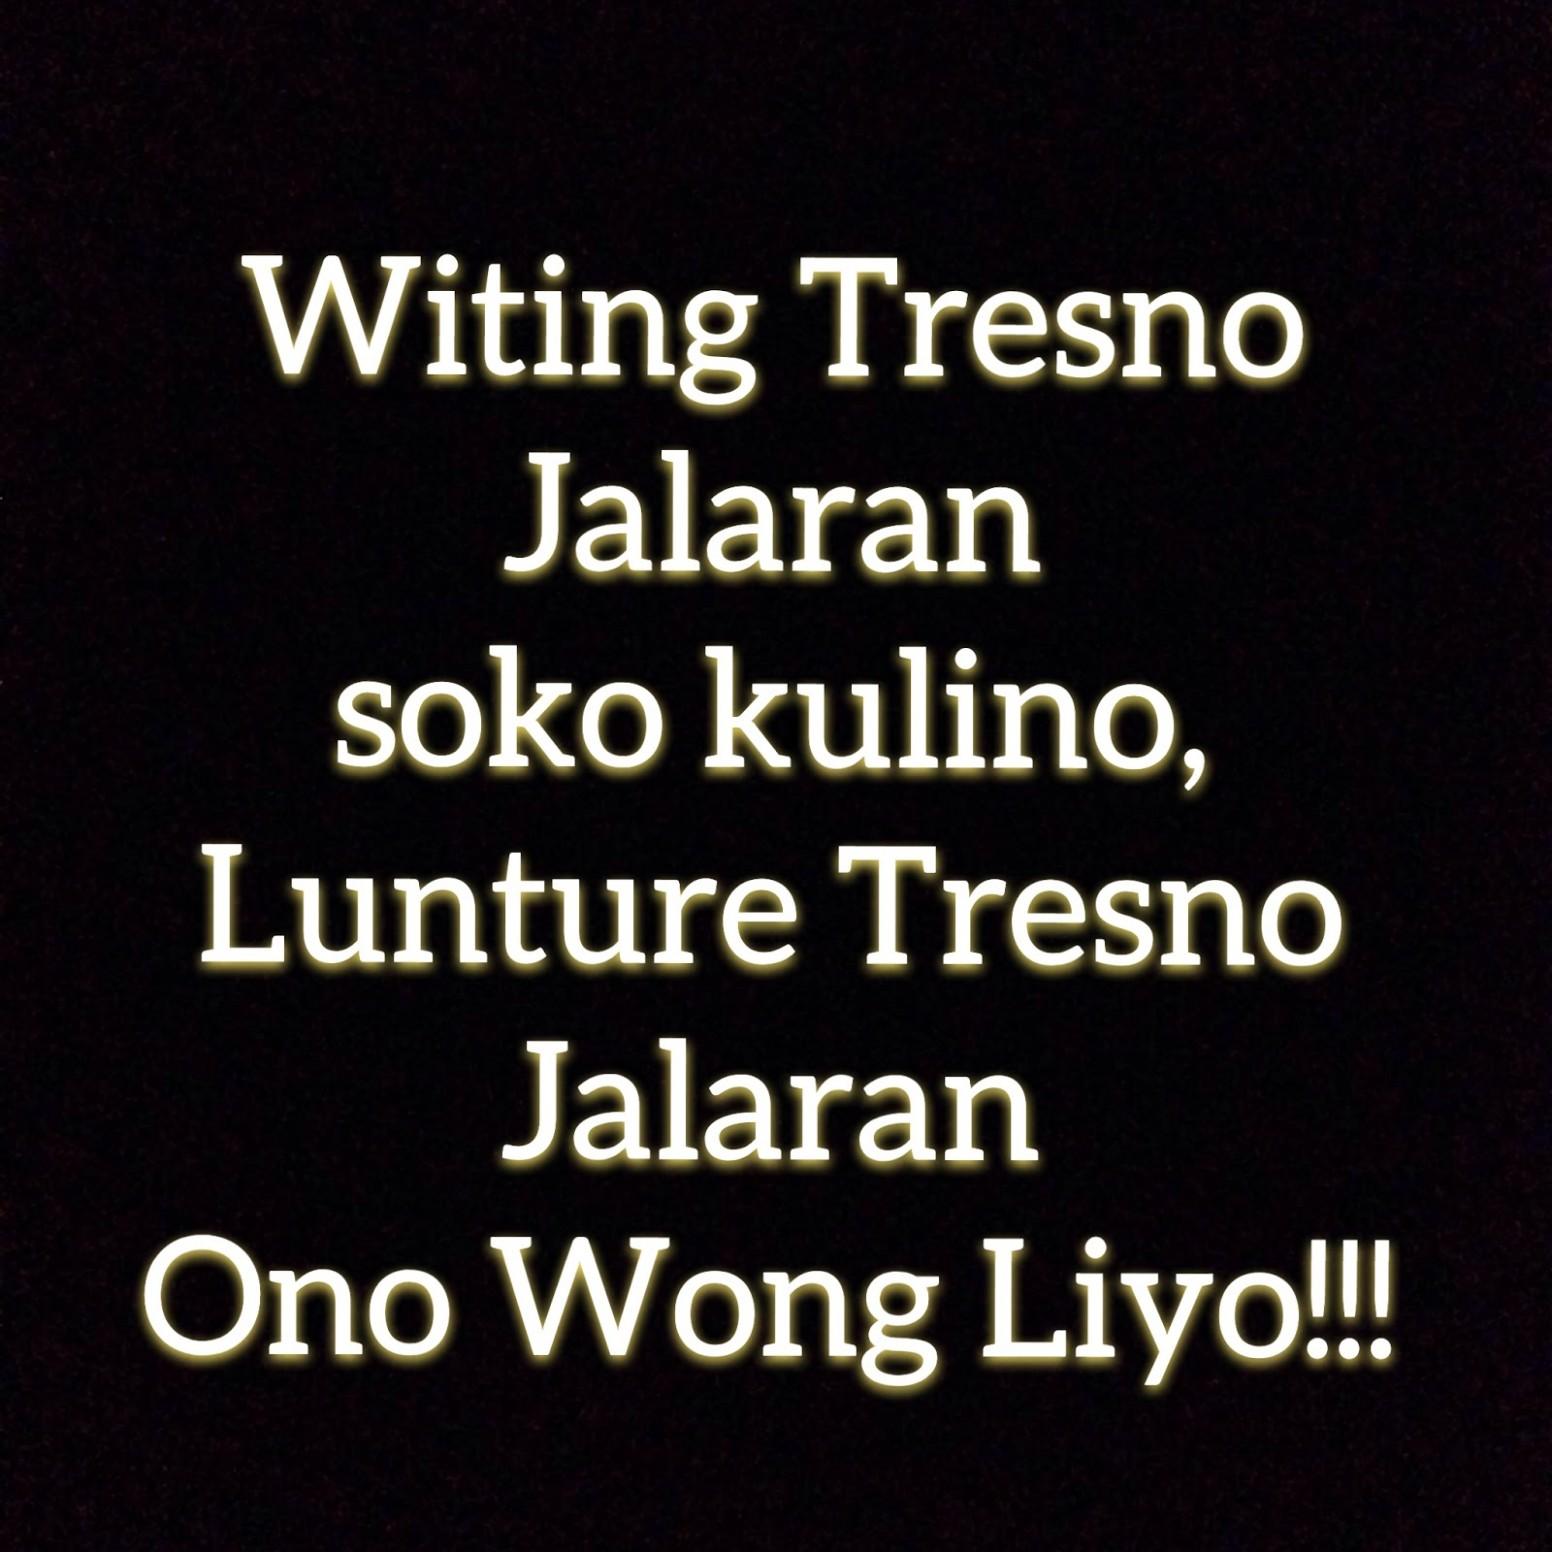 Kata Bijak Jawa Kuno Cikimmcom